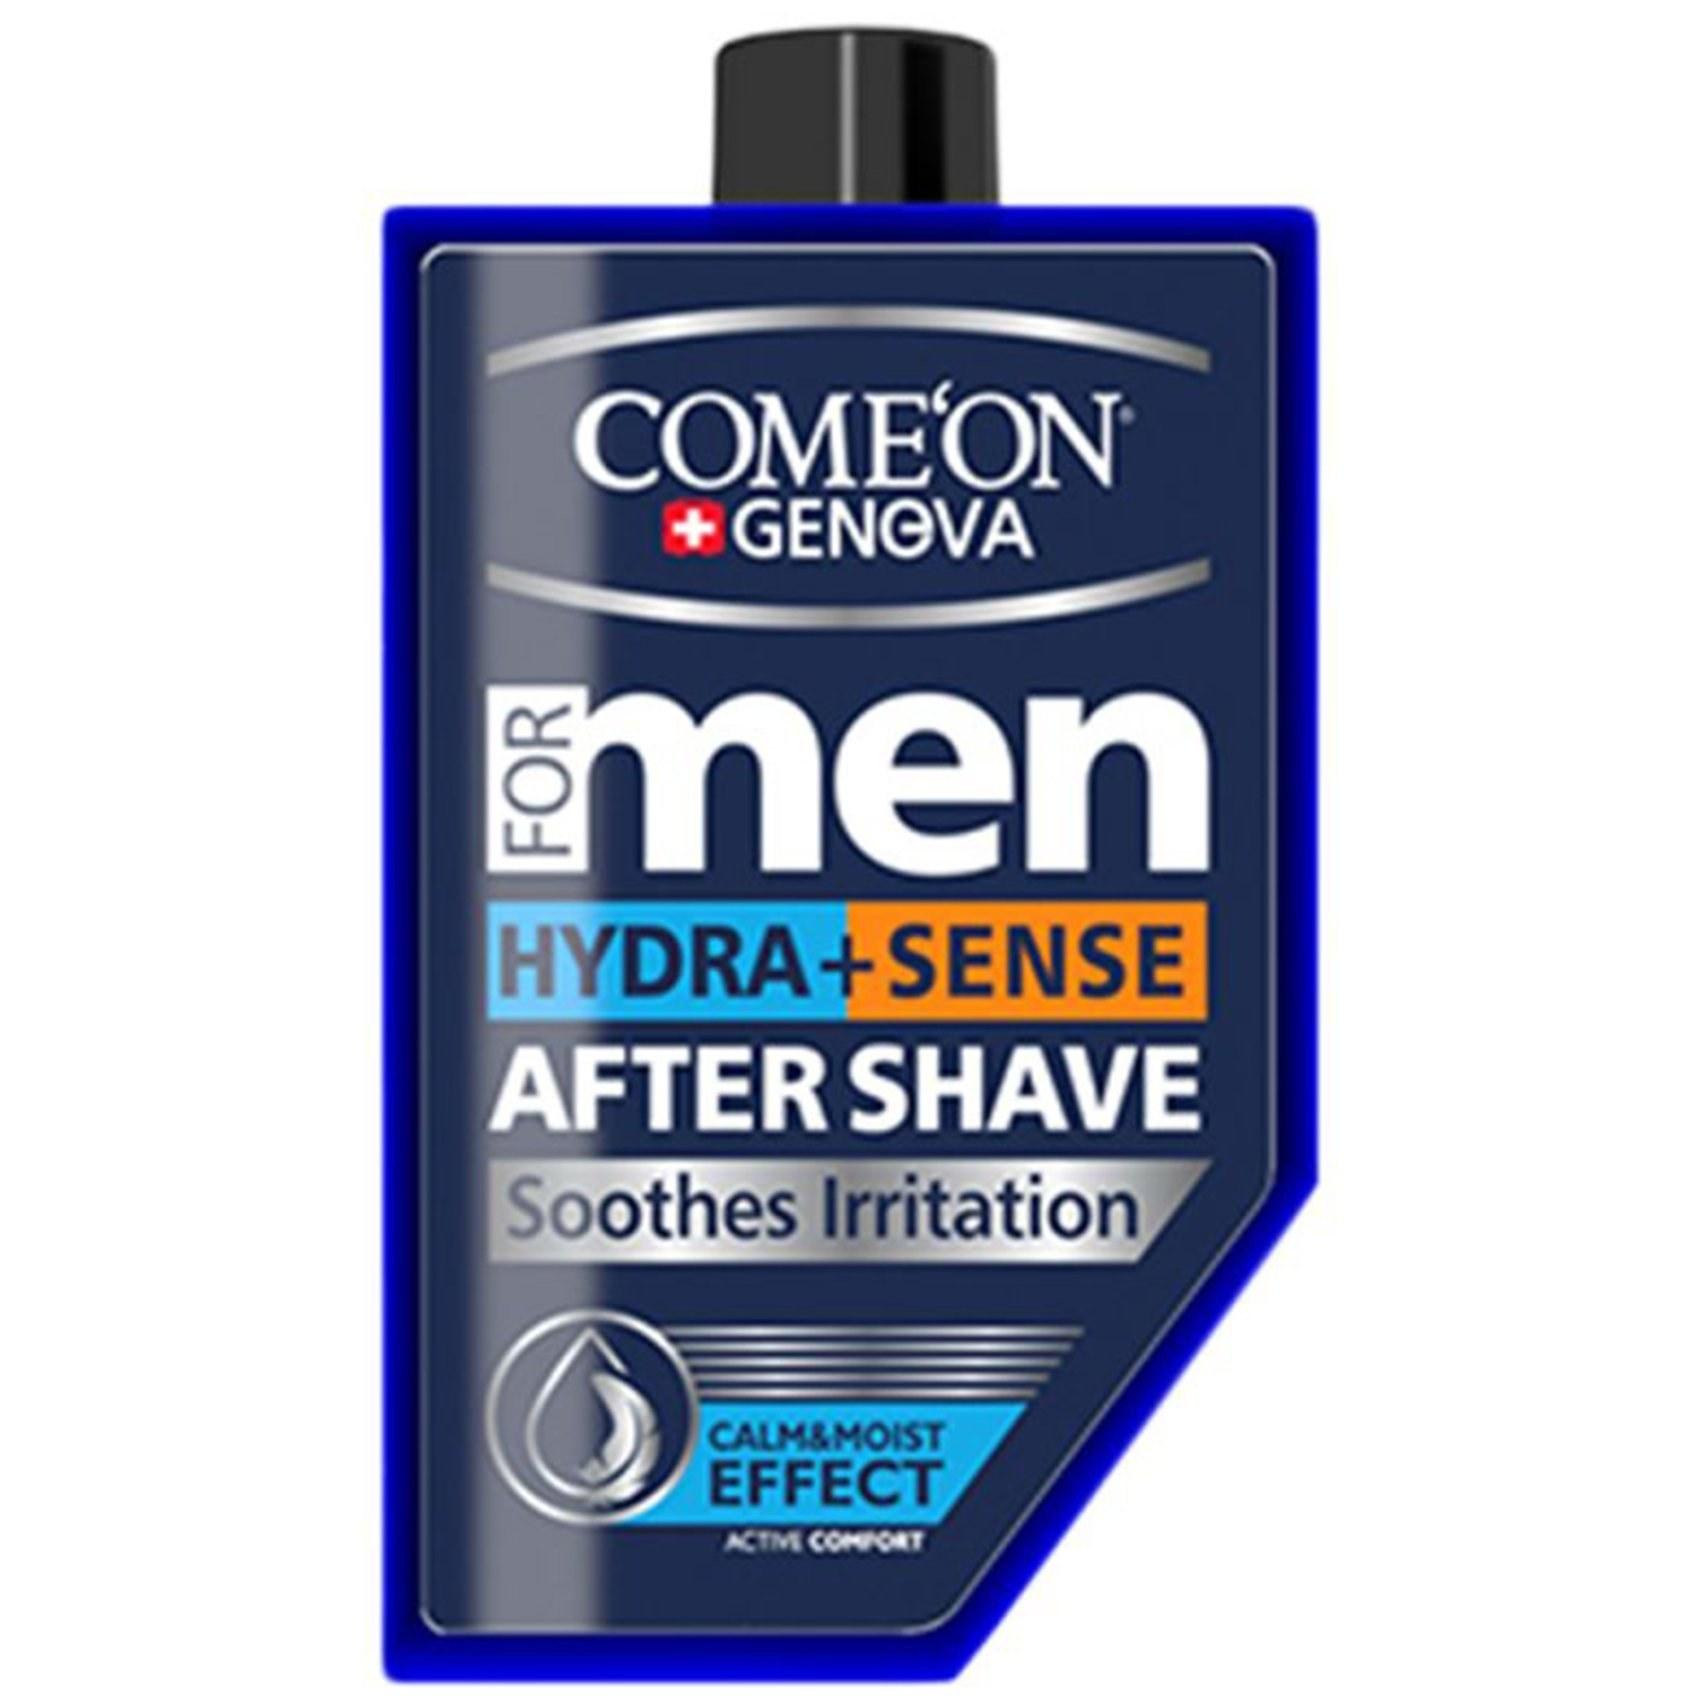 تصویر ژل اصلاح کامان مدل Hydra+Sense  Comeon Hydra And Sense After Shave For Men 260ml